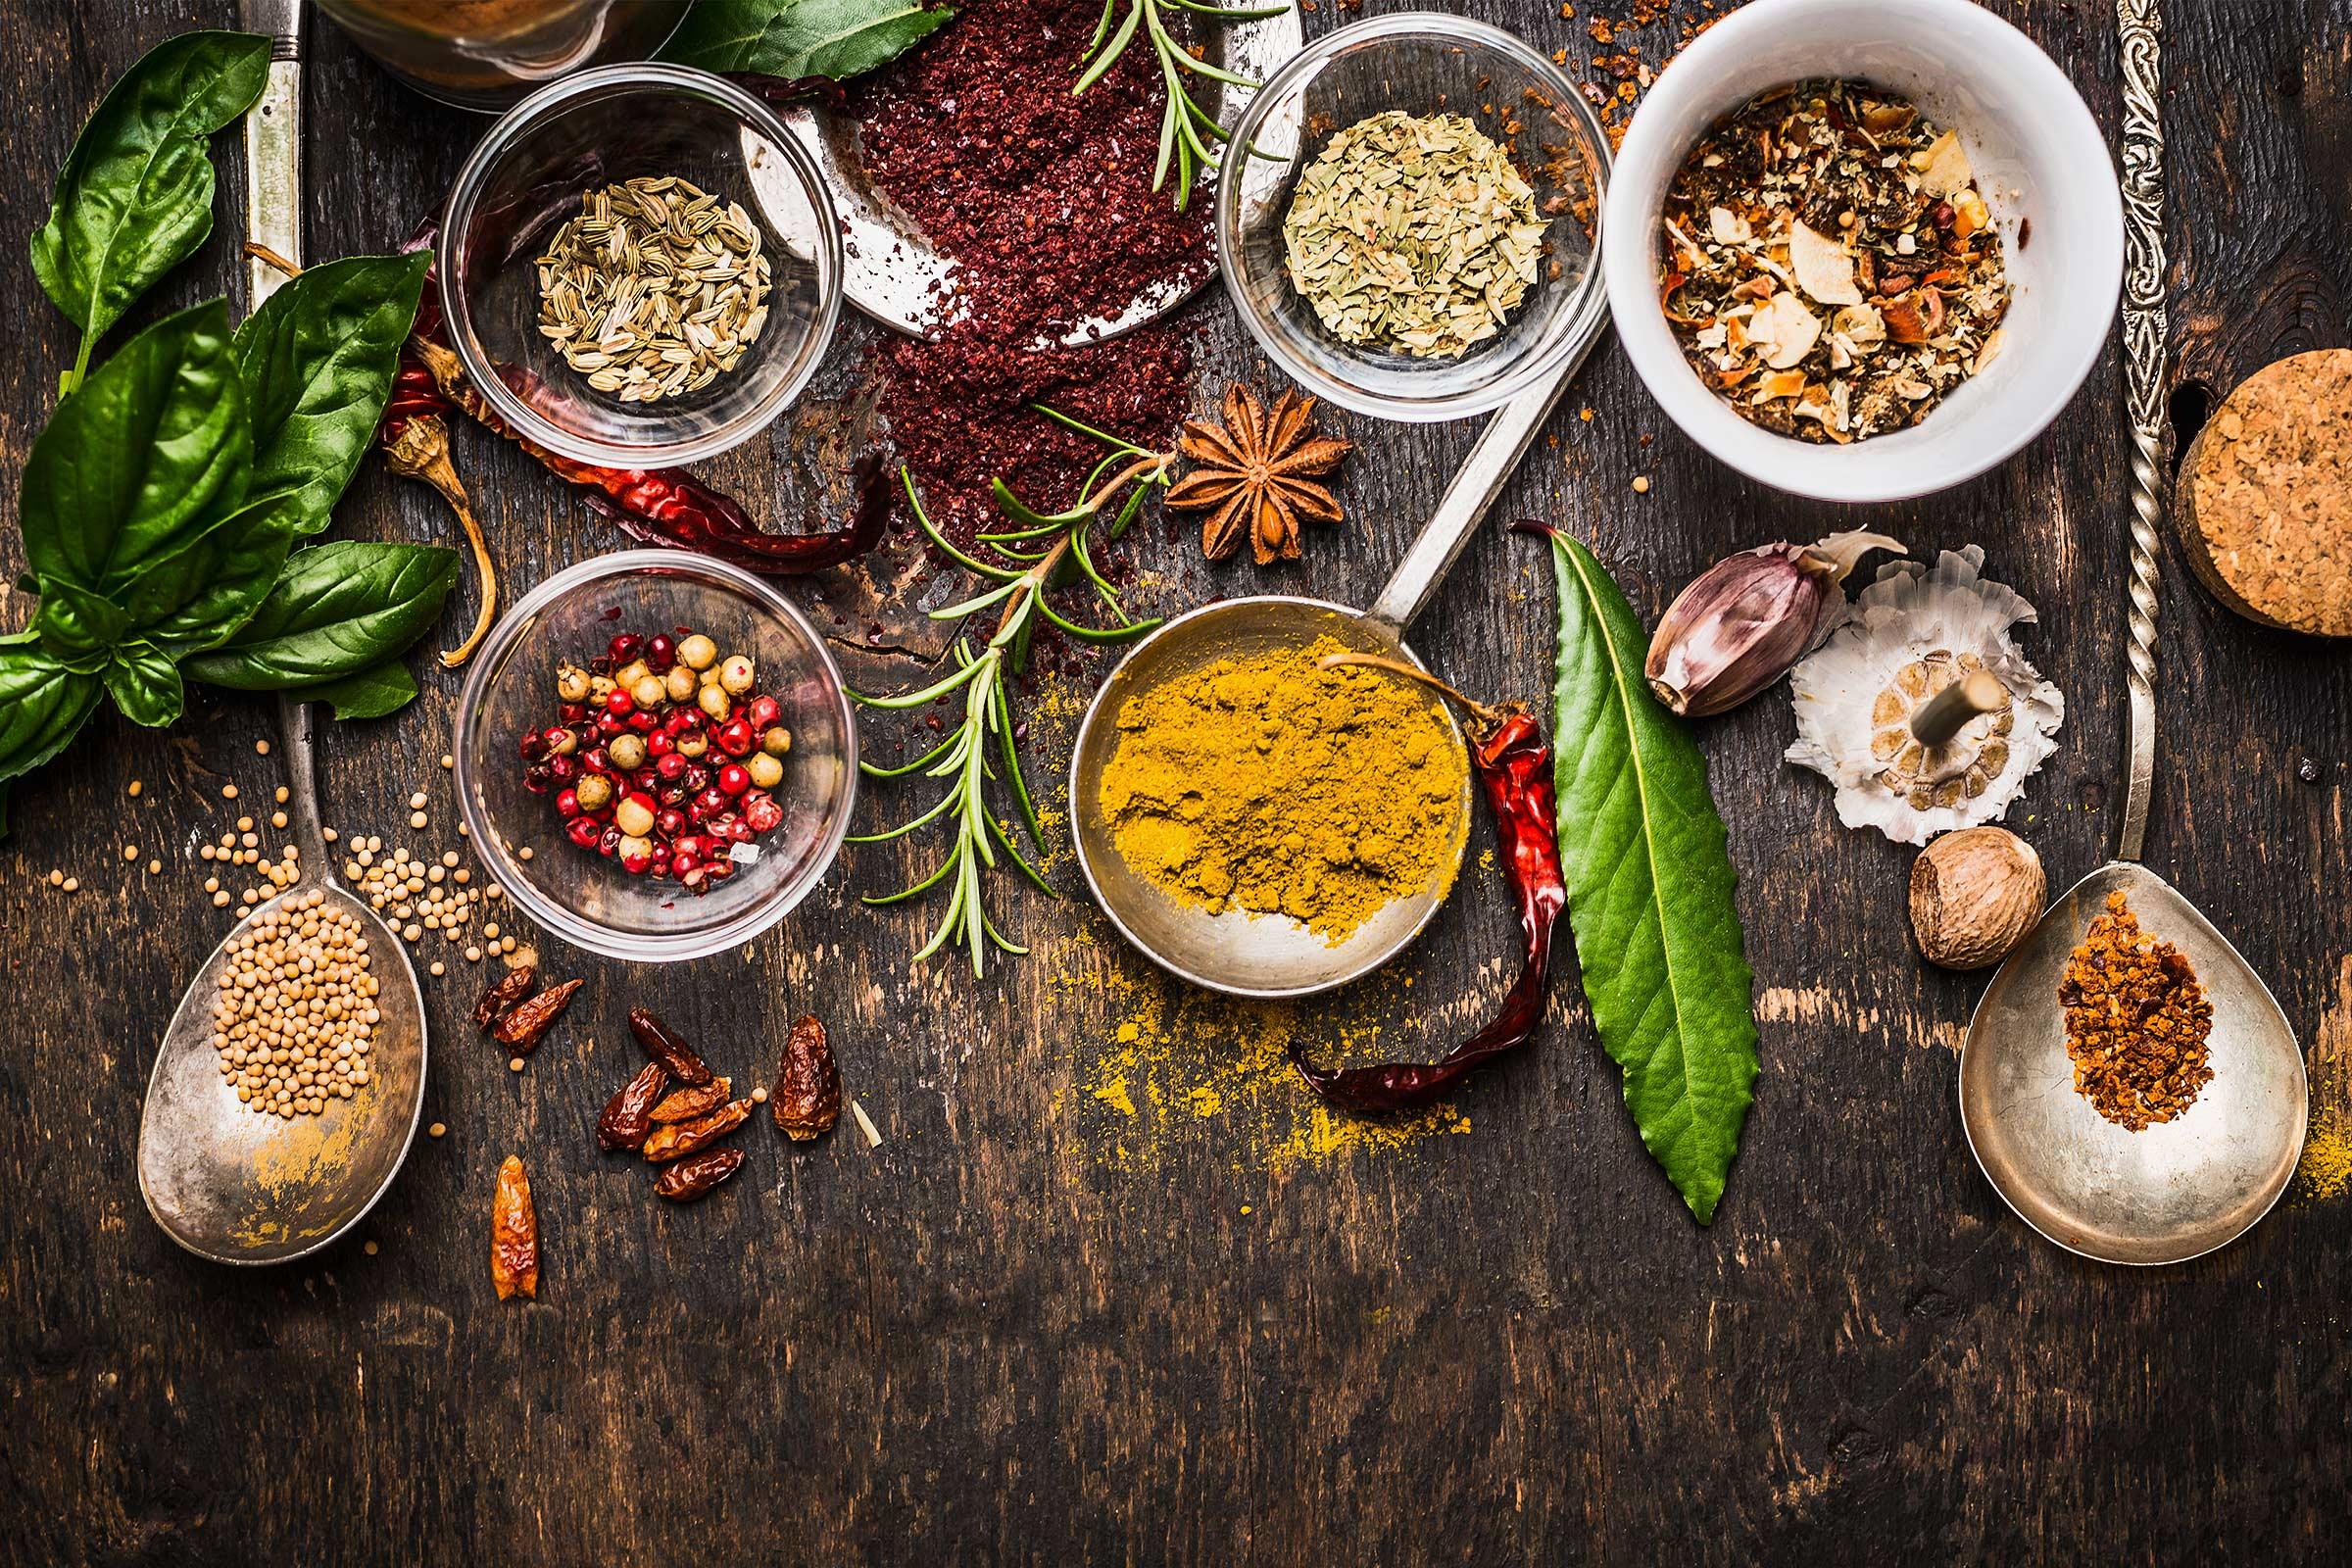 01-herbs-spices-improve-health.jpg